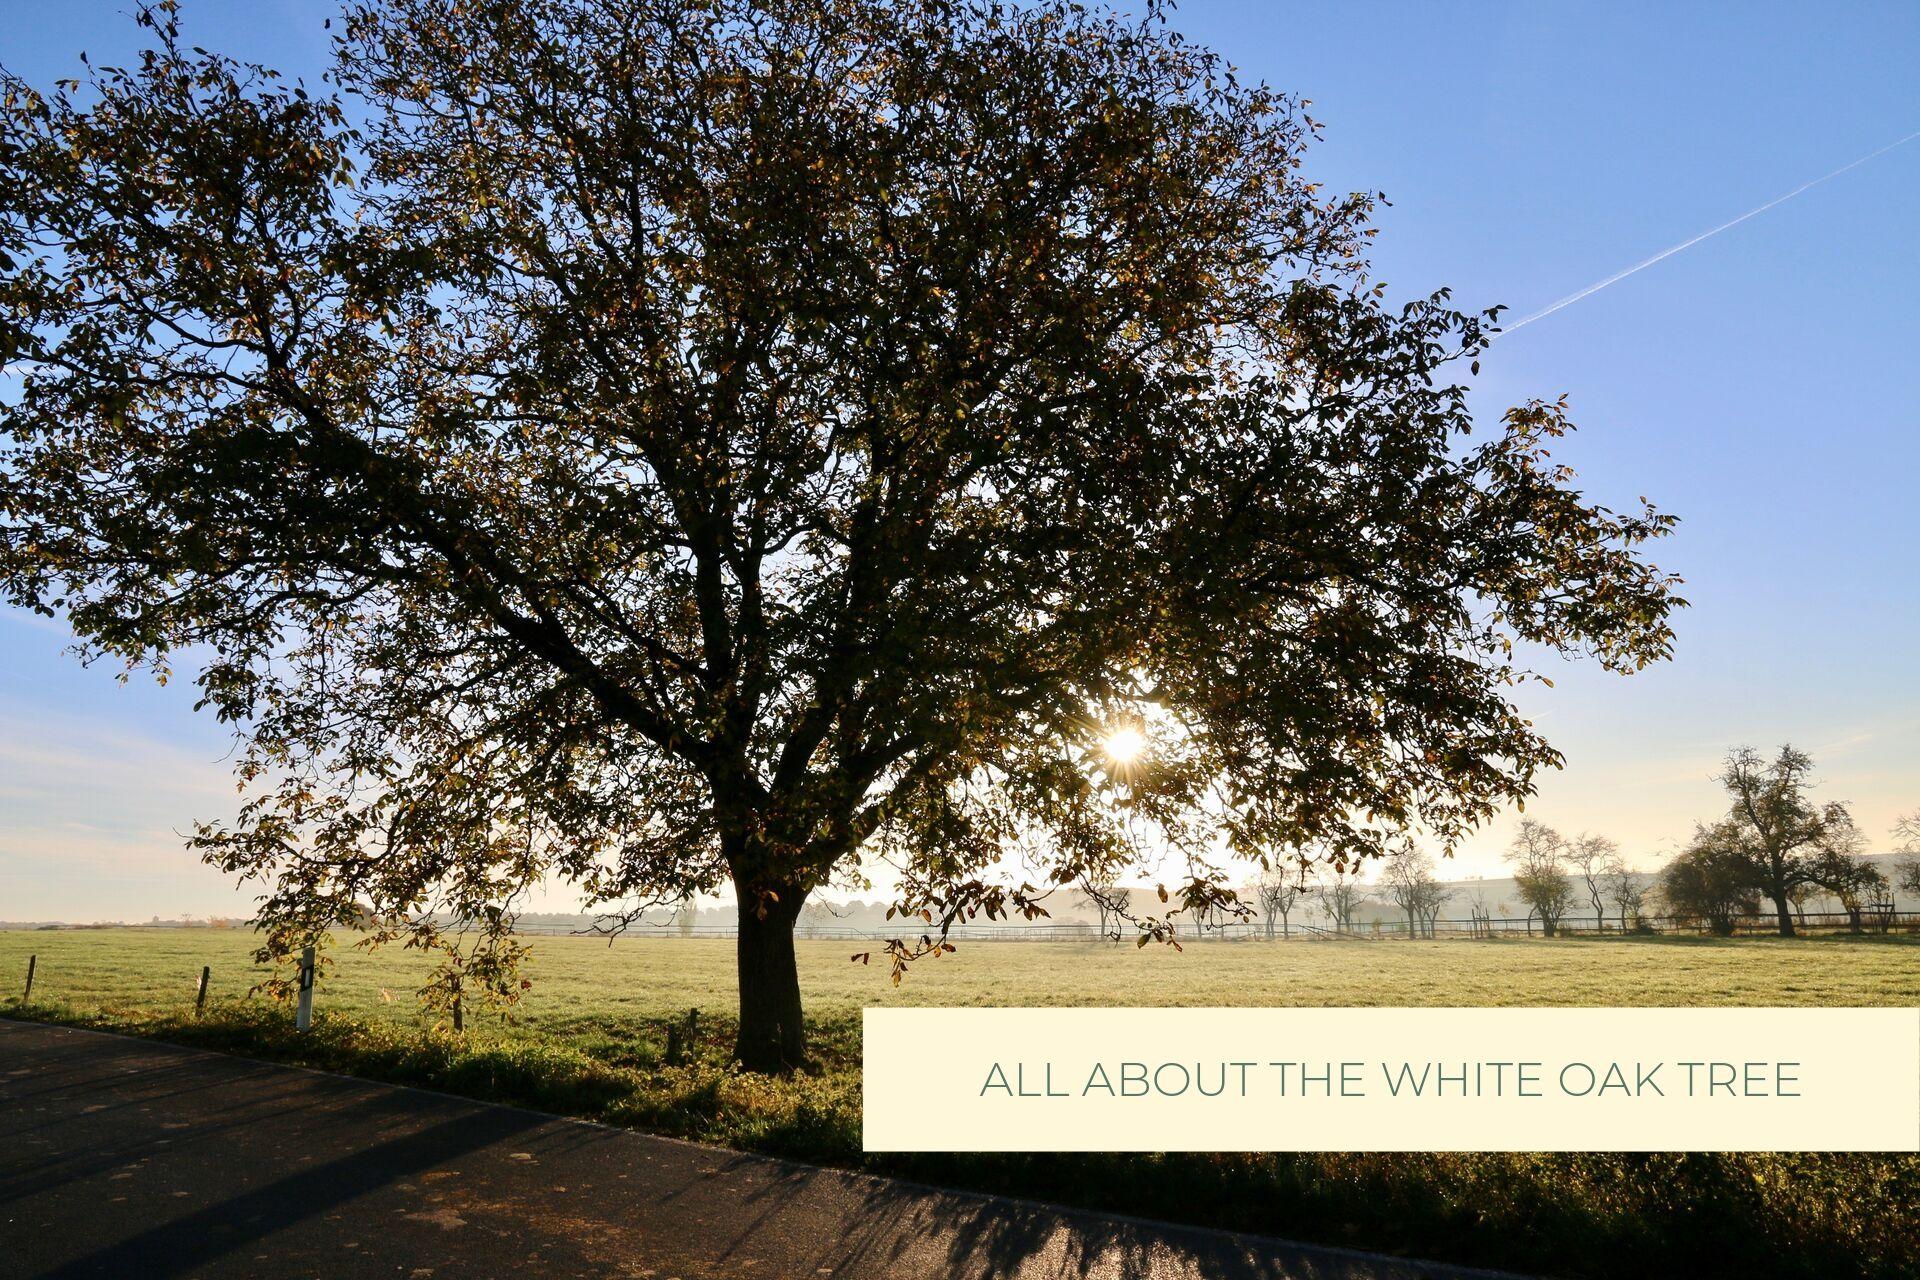 Castle Bespoke_ All about the white oak tree